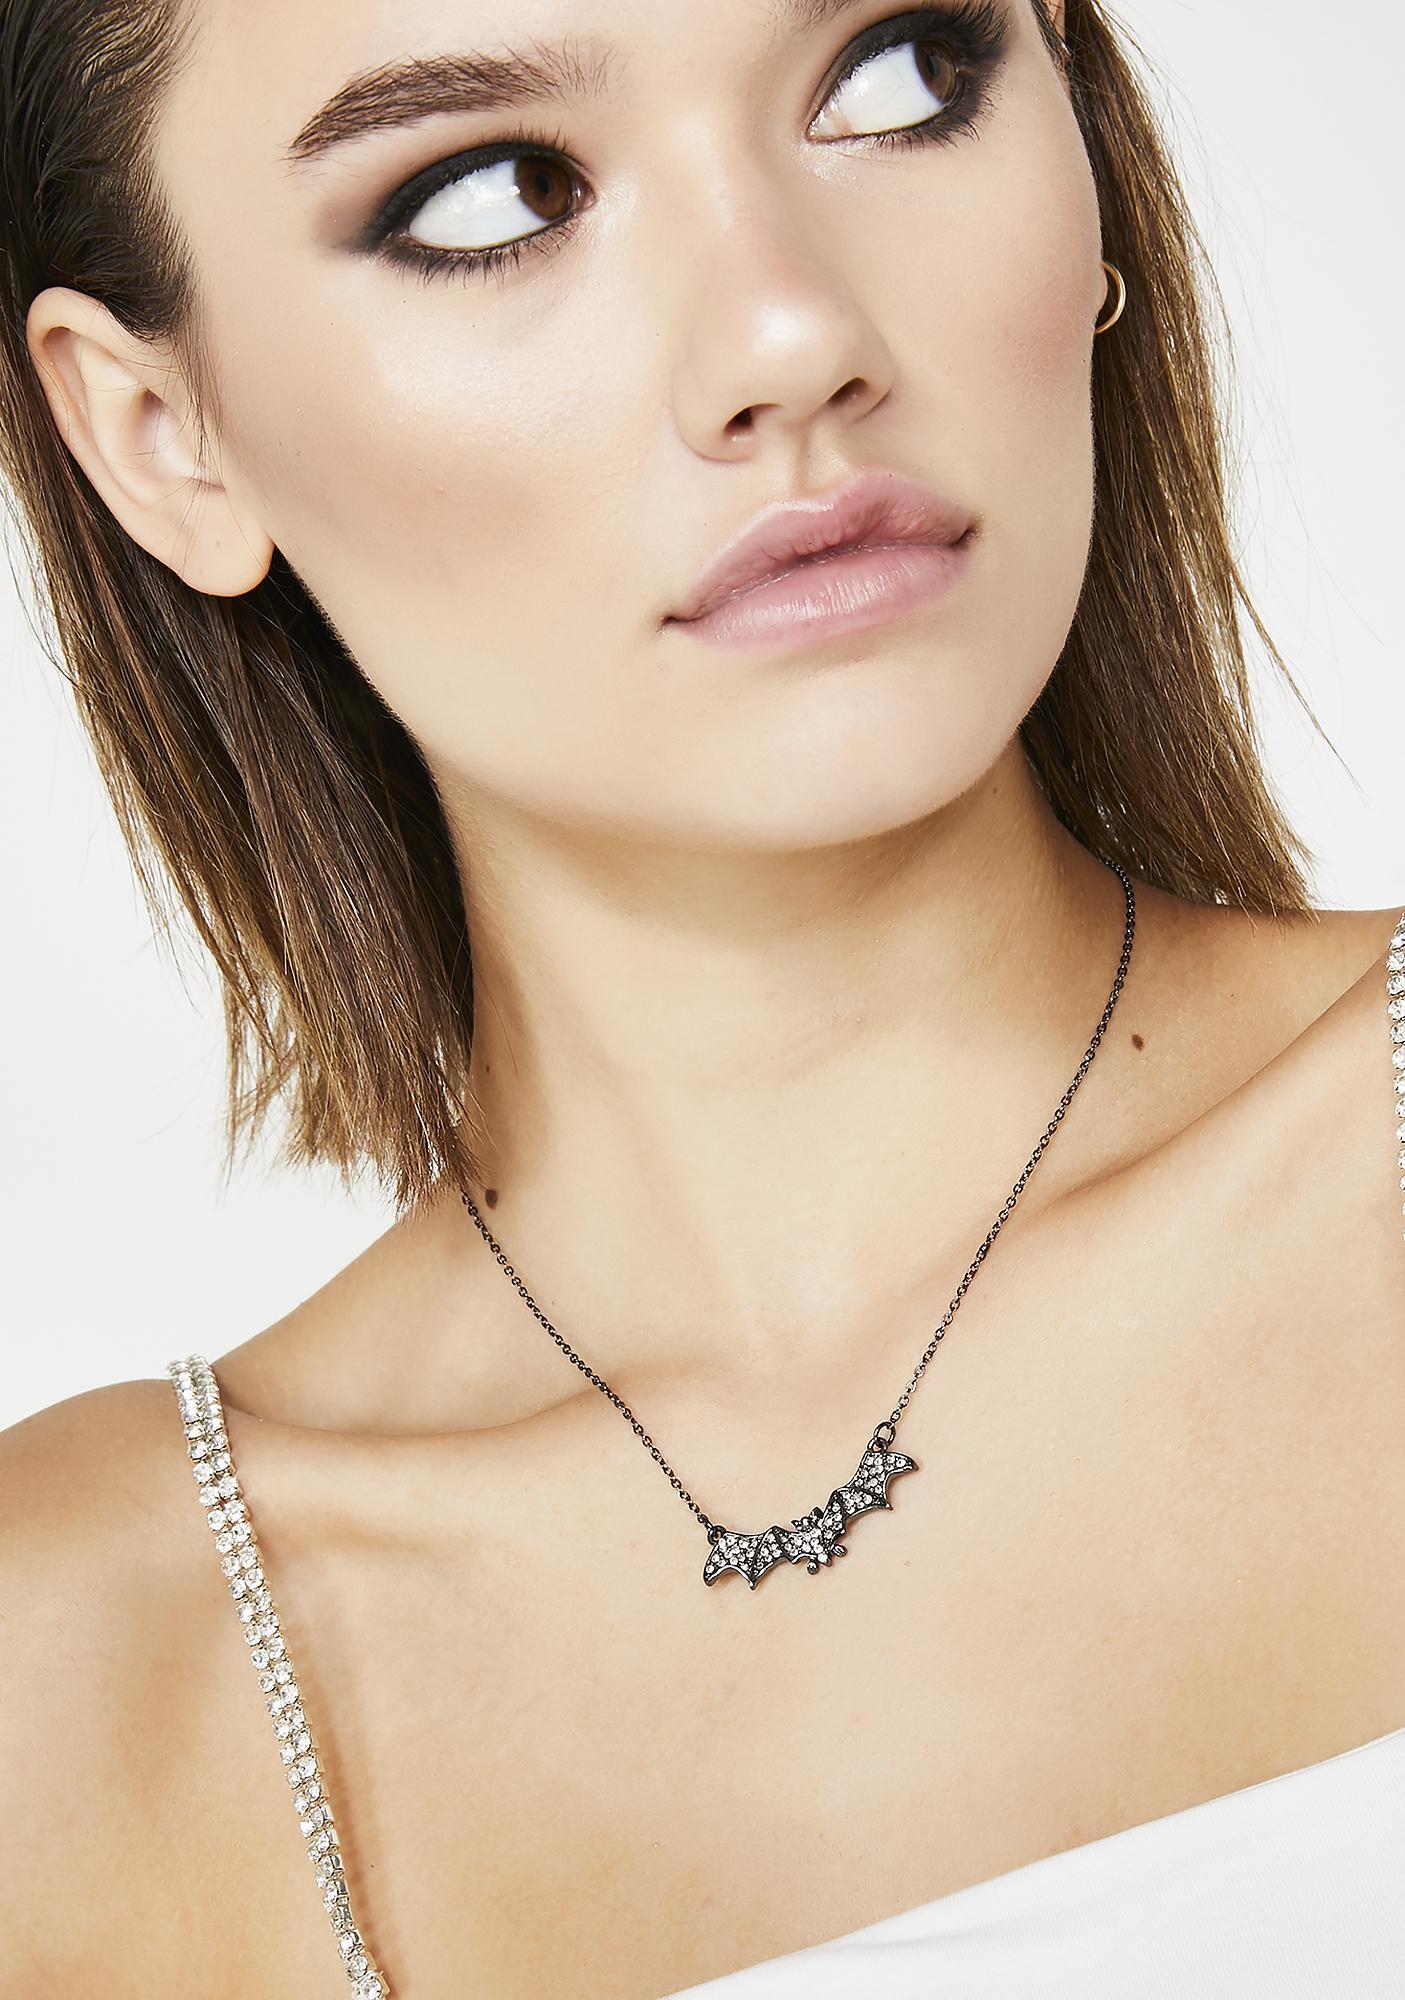 Spooky Sass Bat Necklace